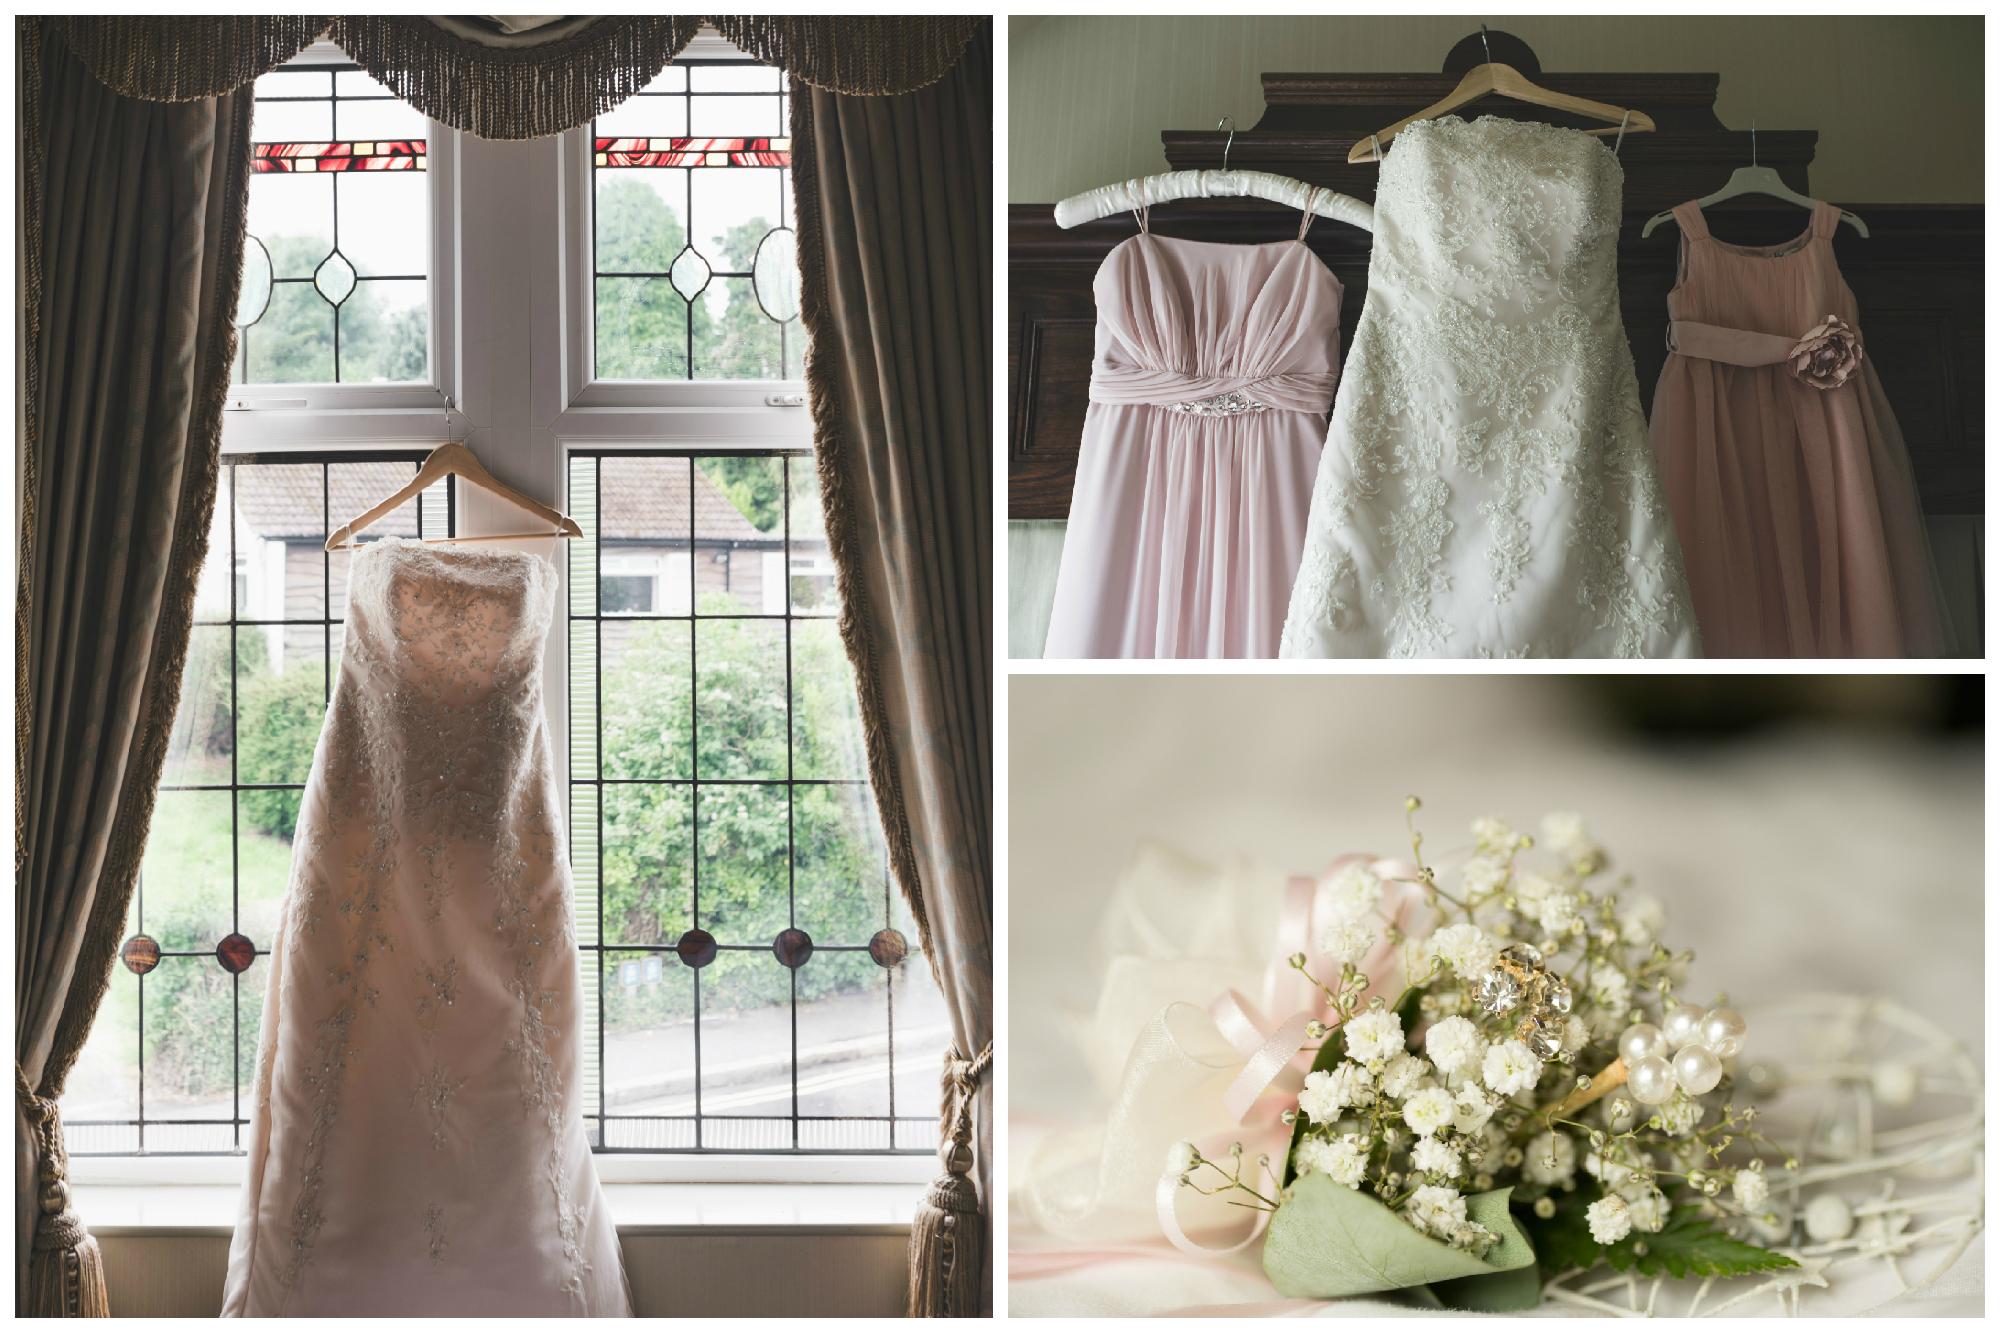 Wedding_Dress_The_Old_Inn_Crawfordsburn